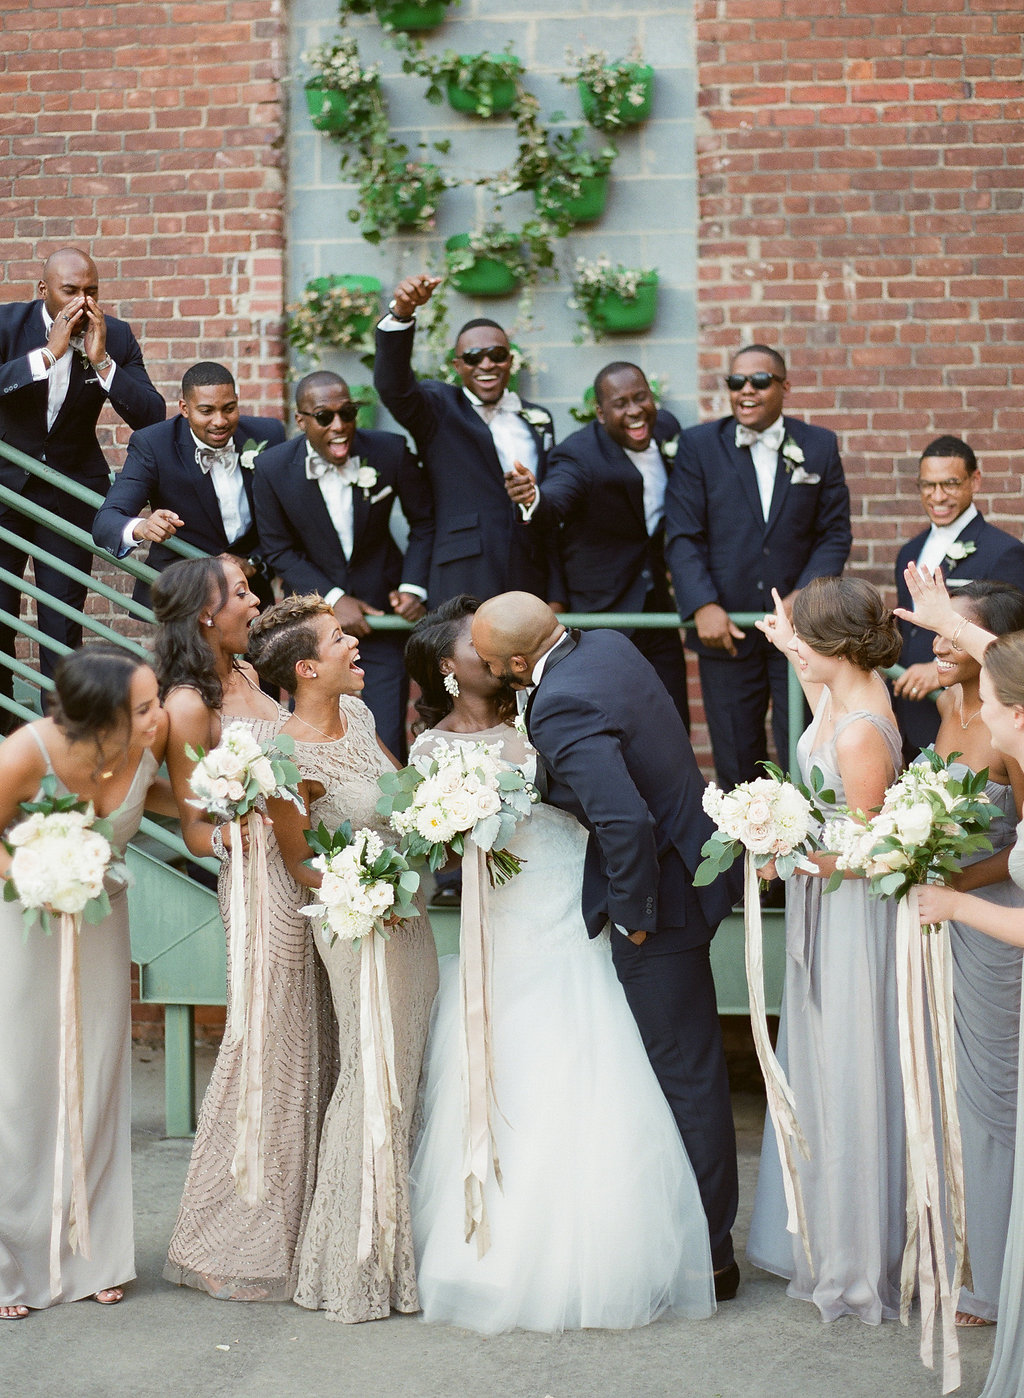 Virginia_Wedding_Photographer_Kristen_Lynne_Photography-275.jpg